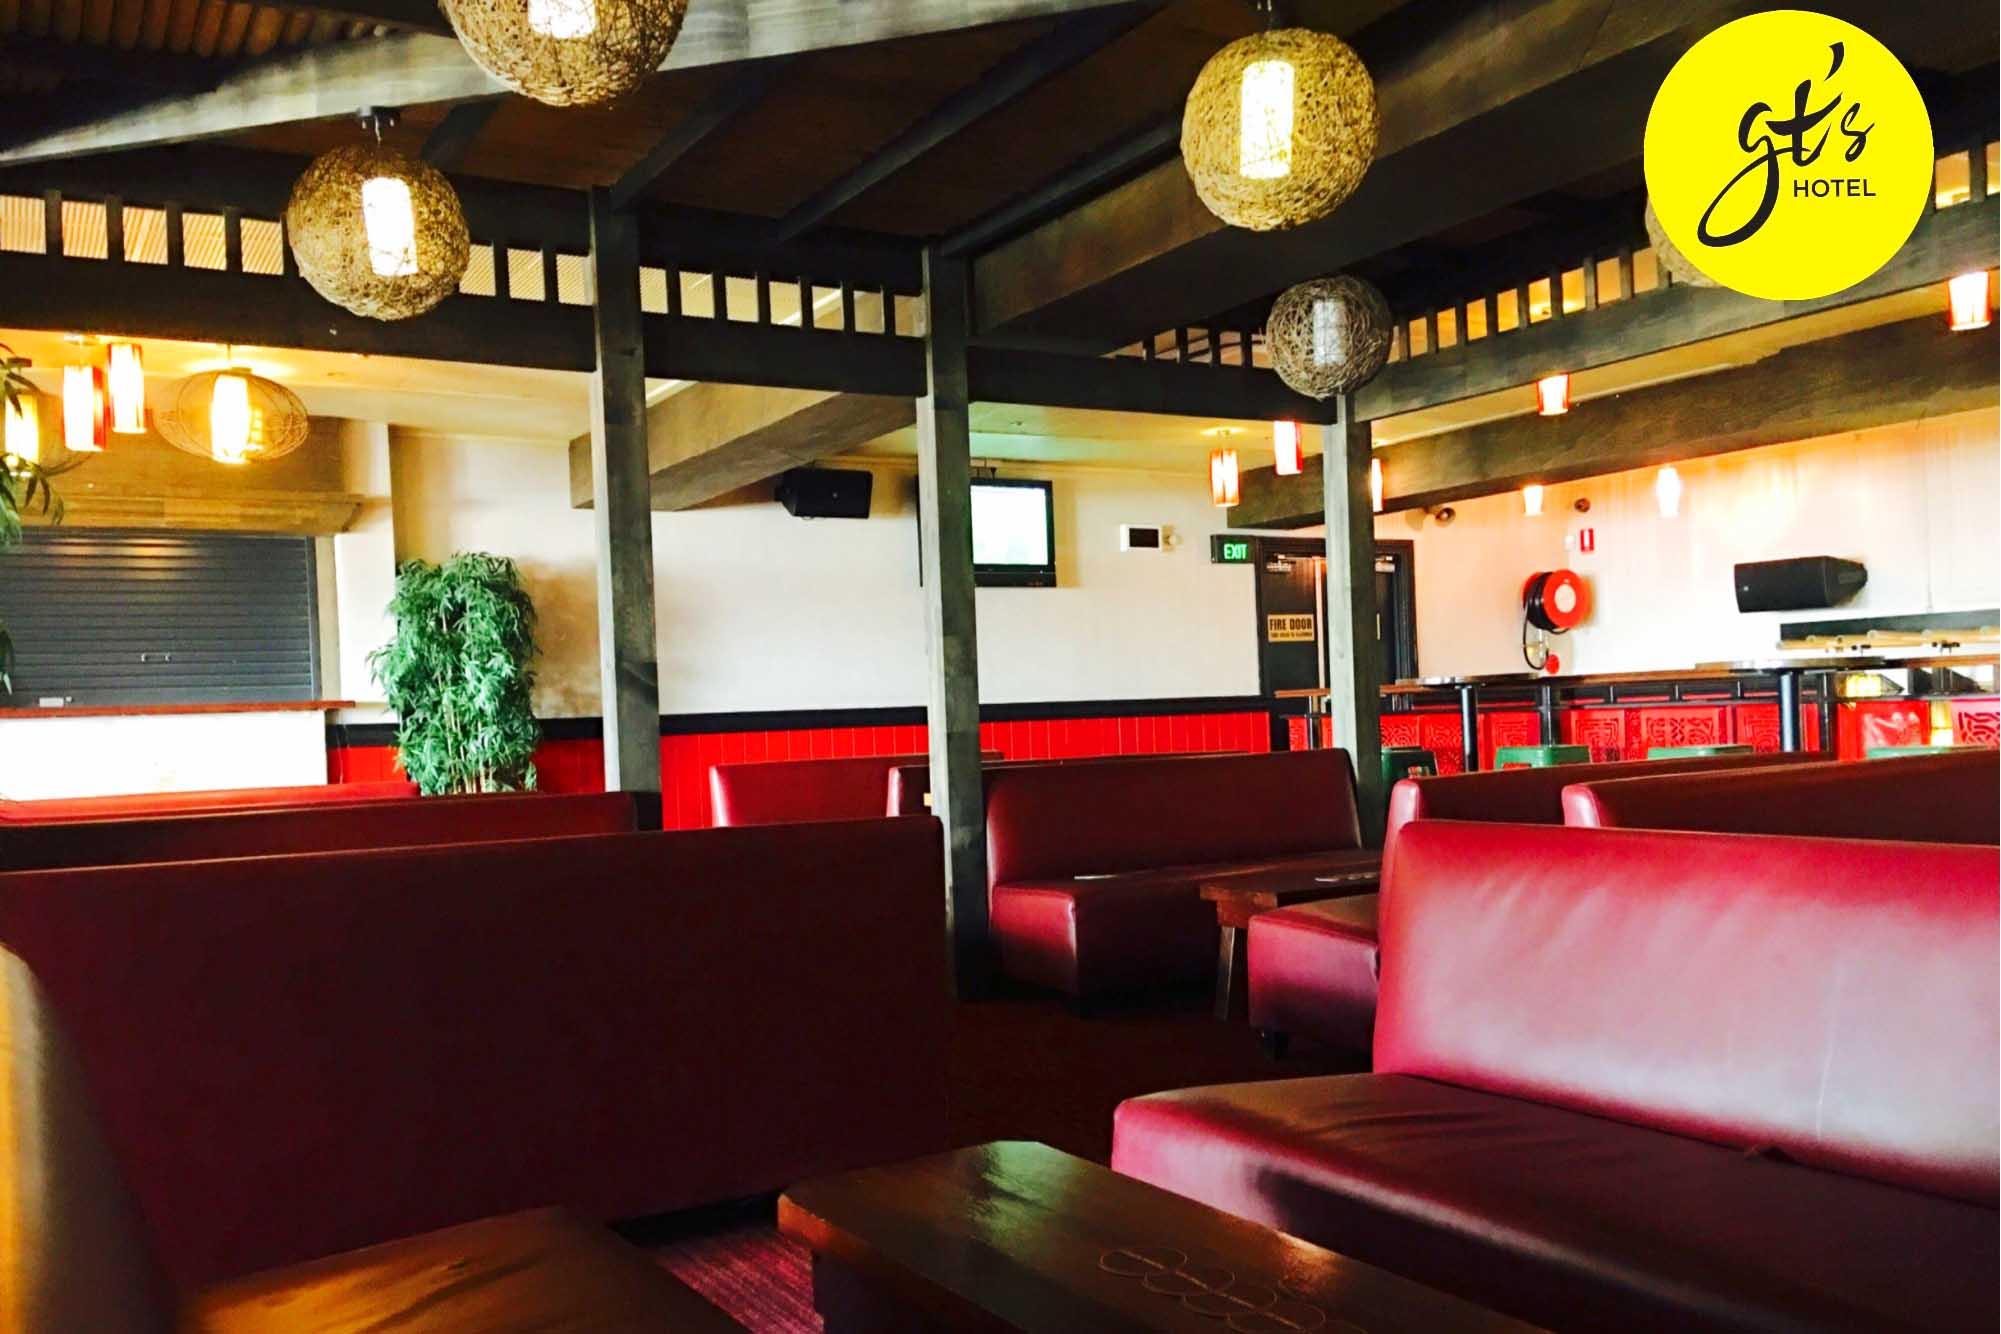 Gt's Hotel – Surry Hills Venues